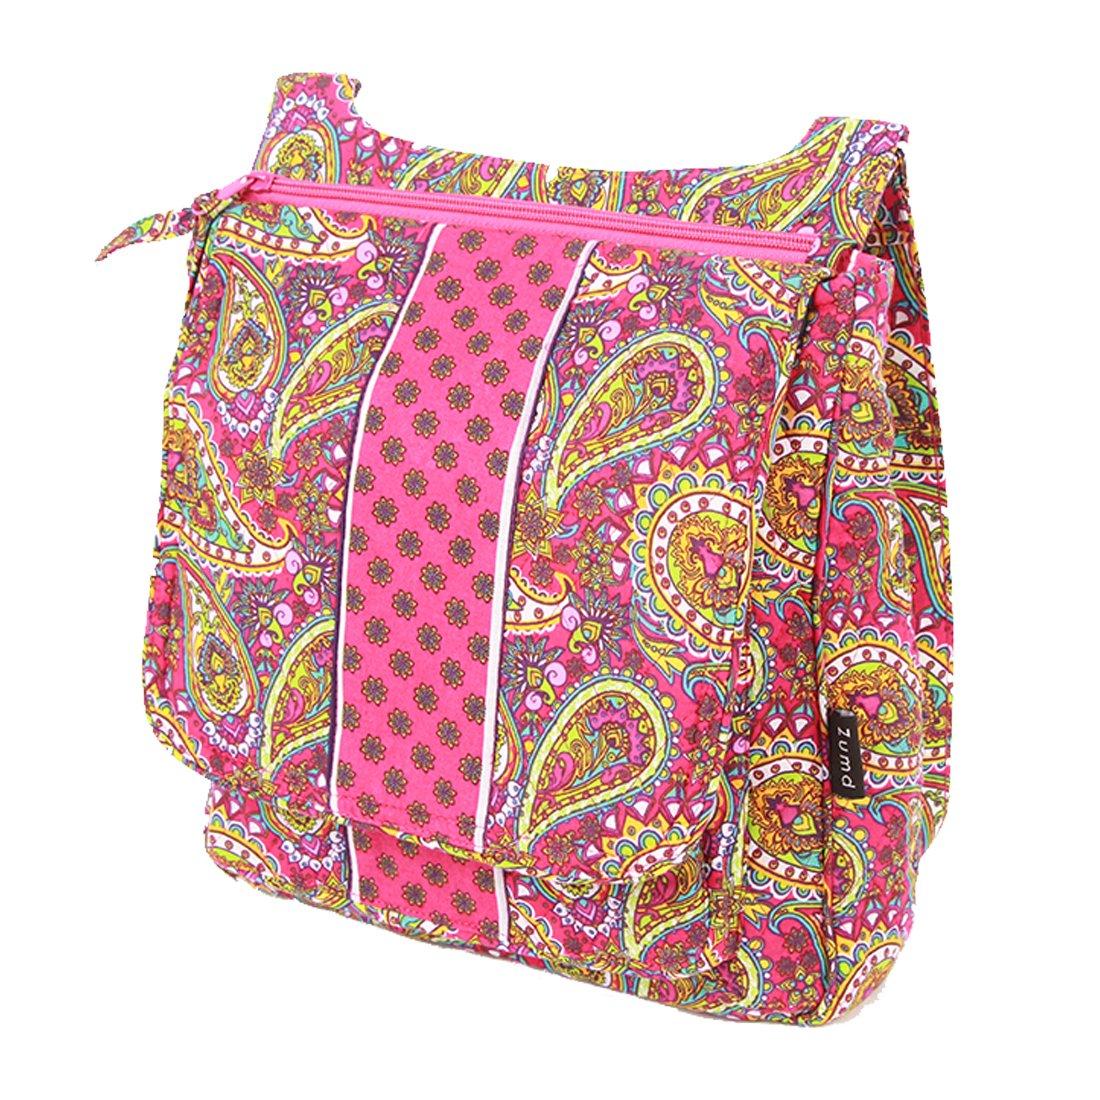 Cotton Cross body bag (Paisley Pink)